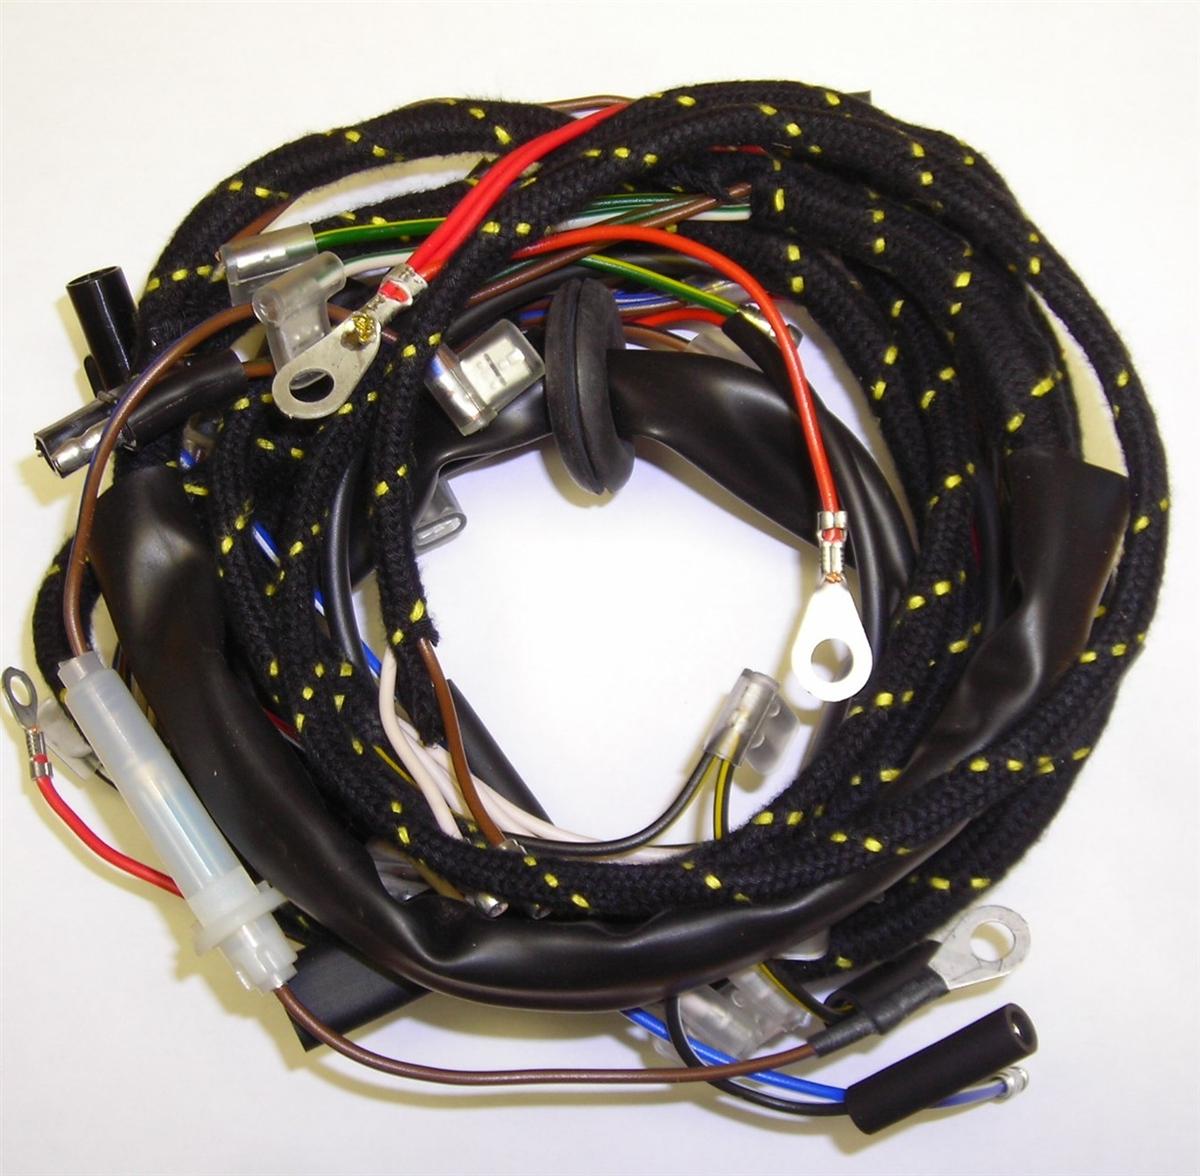 medium resolution of 1972 ford mustang wiring diagram mgb fuse box diagram 1969 triumph tr6 wiring harness triumph spitfire wiring